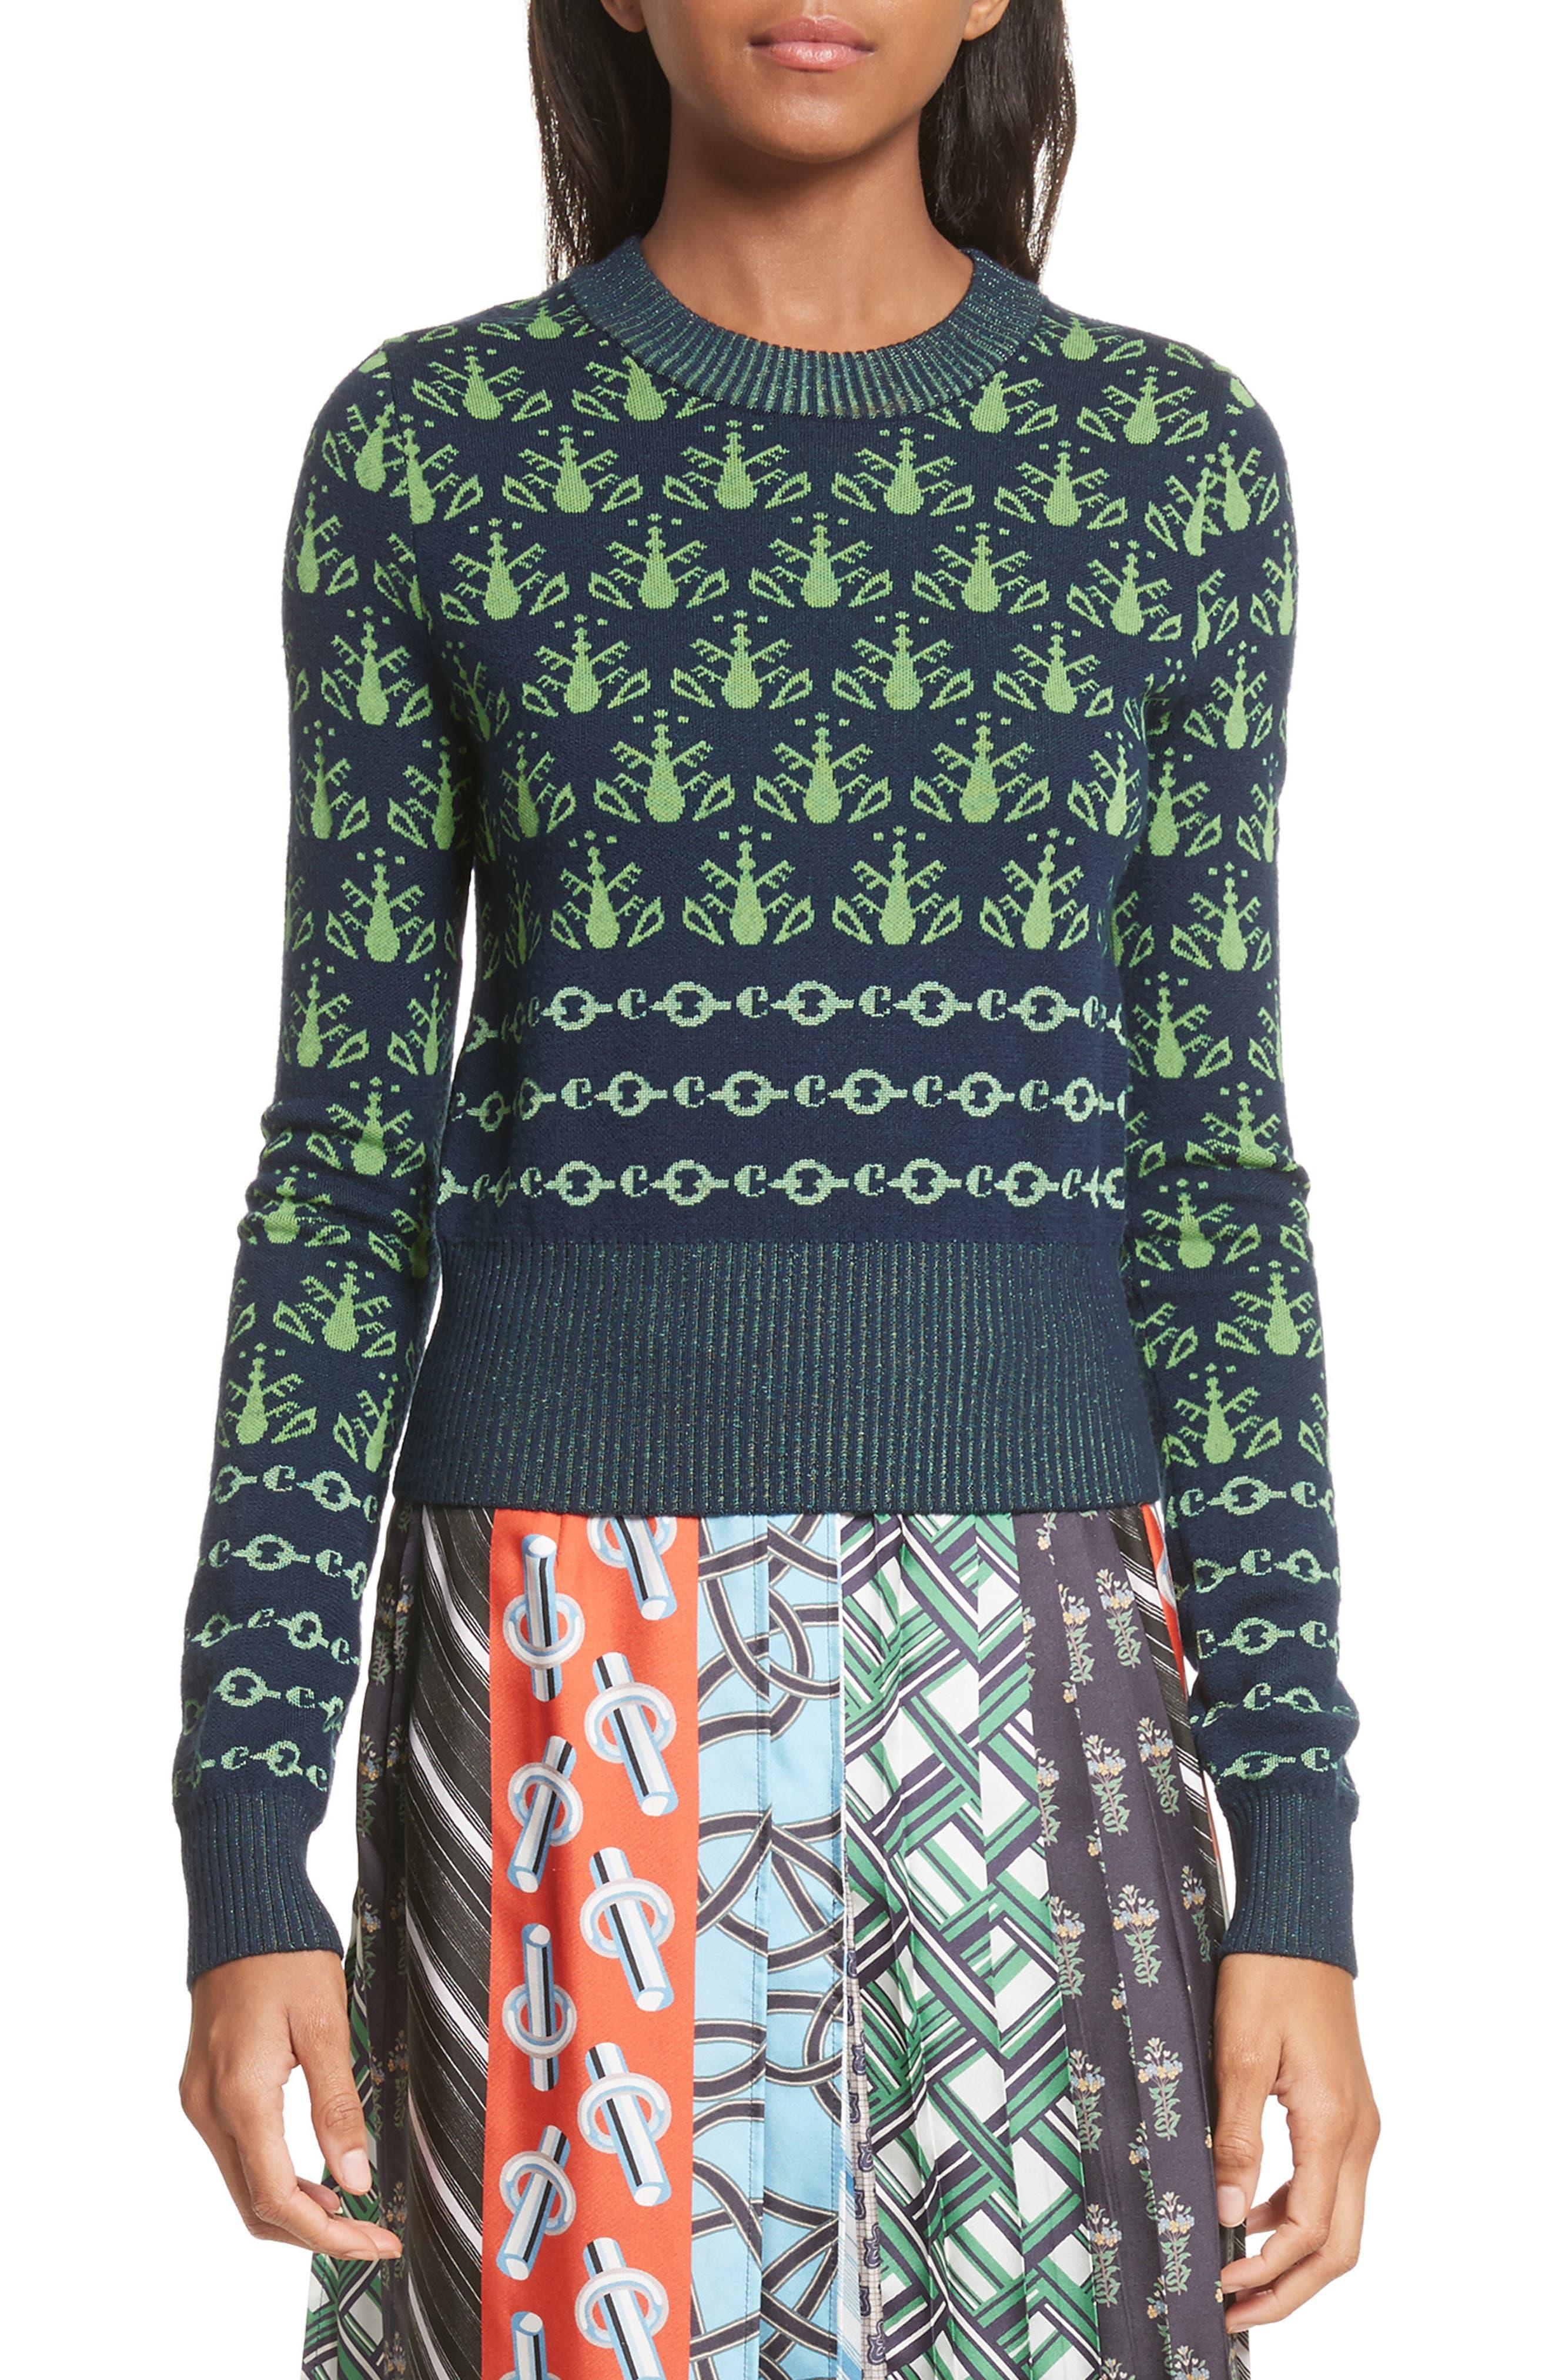 Alternate Image 1 Selected - Carven Merino Wool Sweater